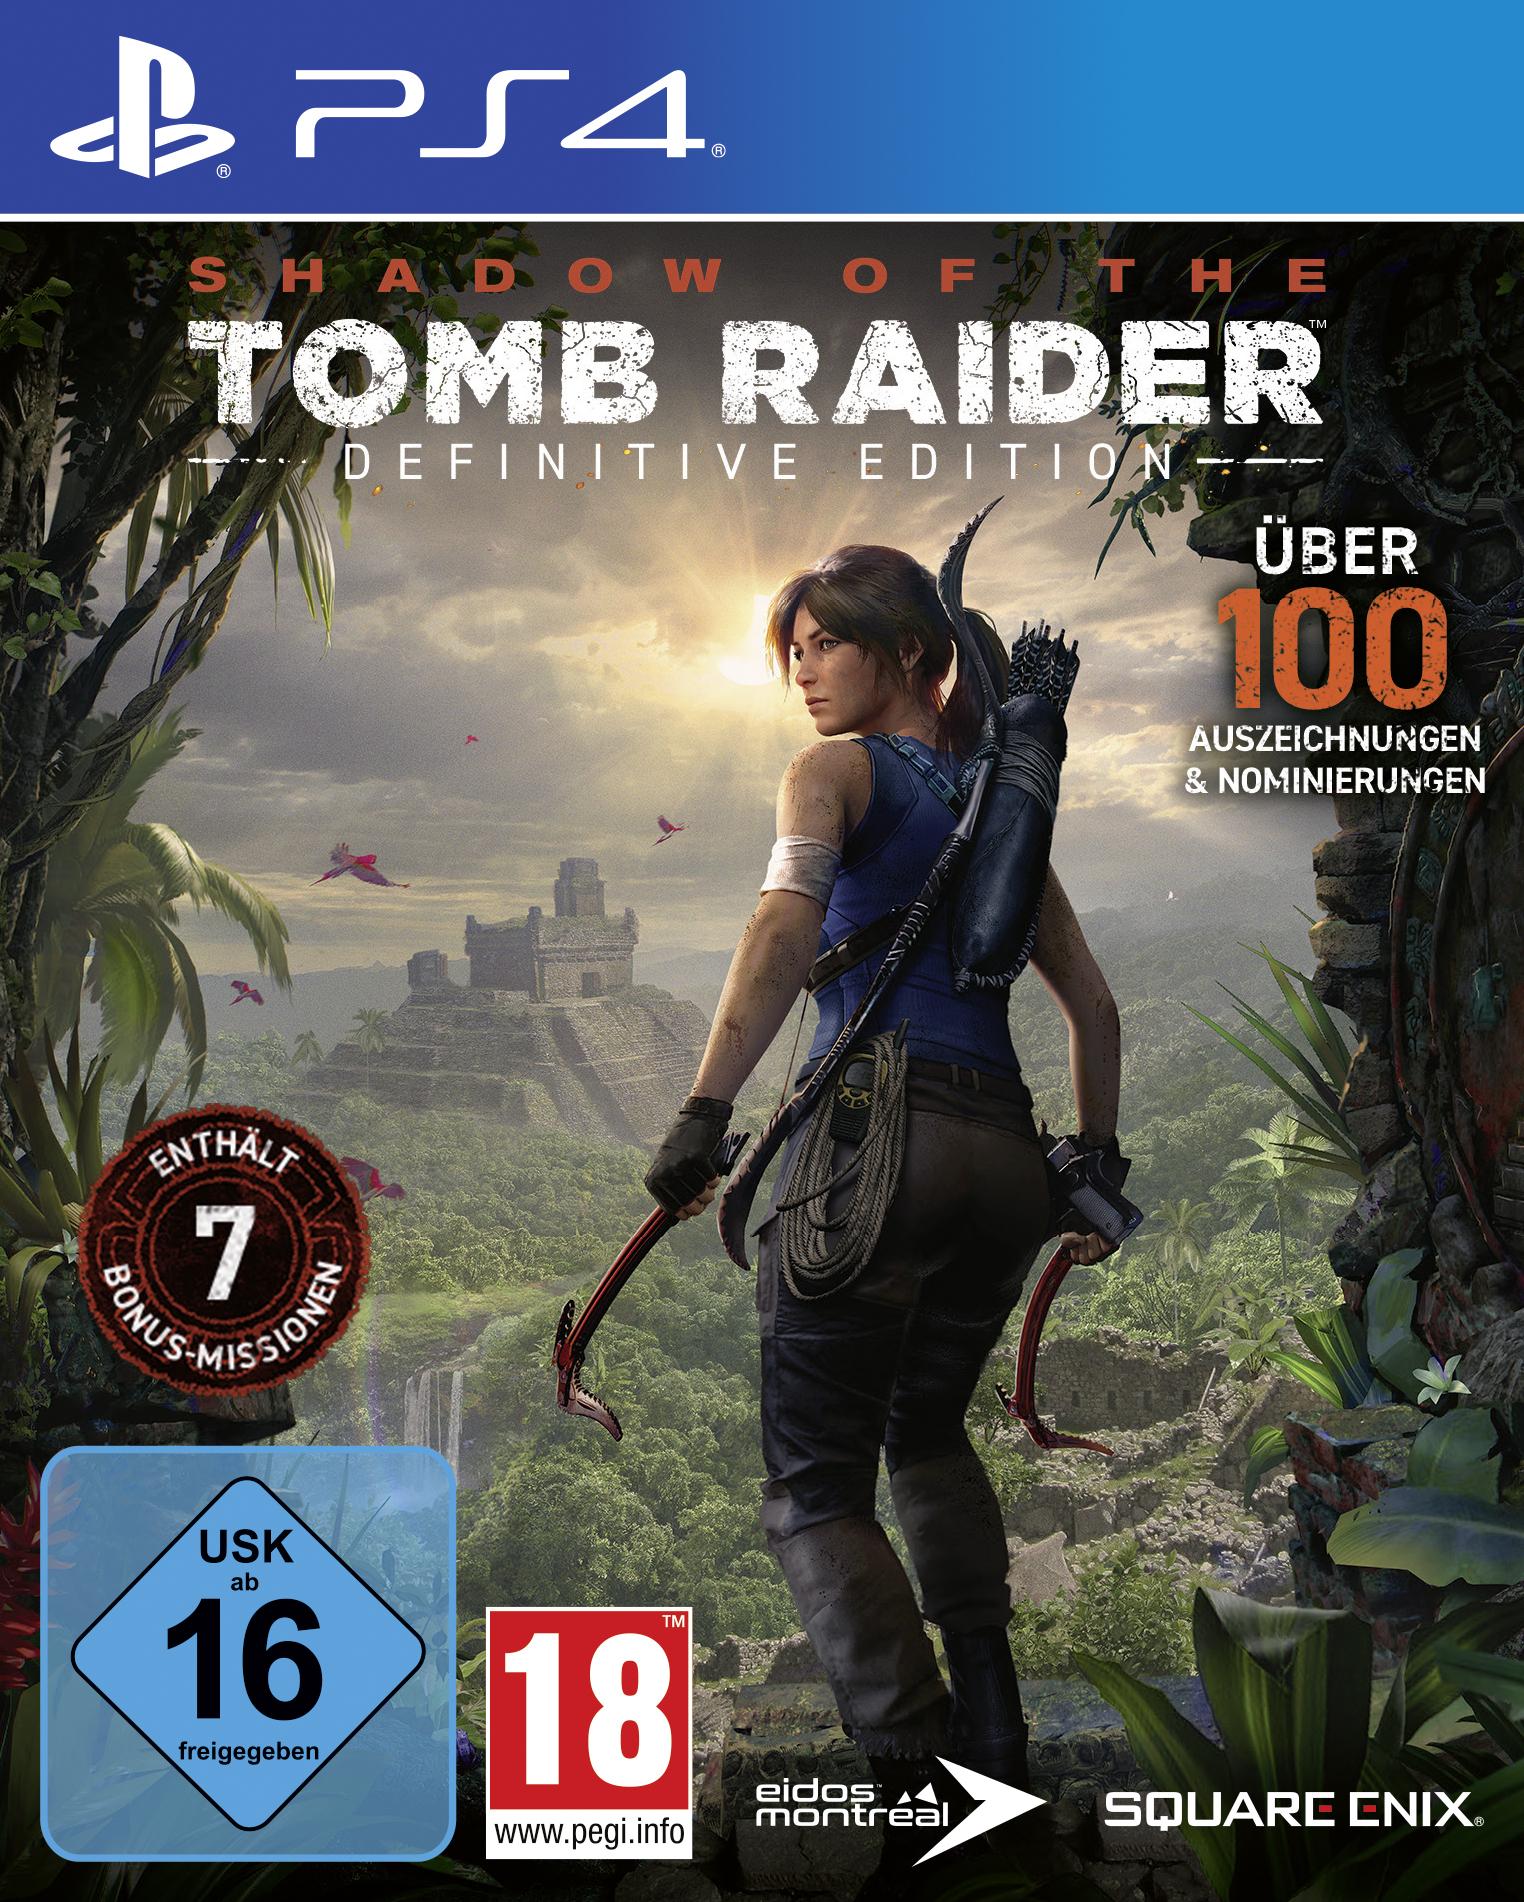 Shadow of the Tomb Raider Definitive Edition (PS4) für 16,50€ & (Xbox One) für 19,99€ (Square Enix Store & Coolshop)